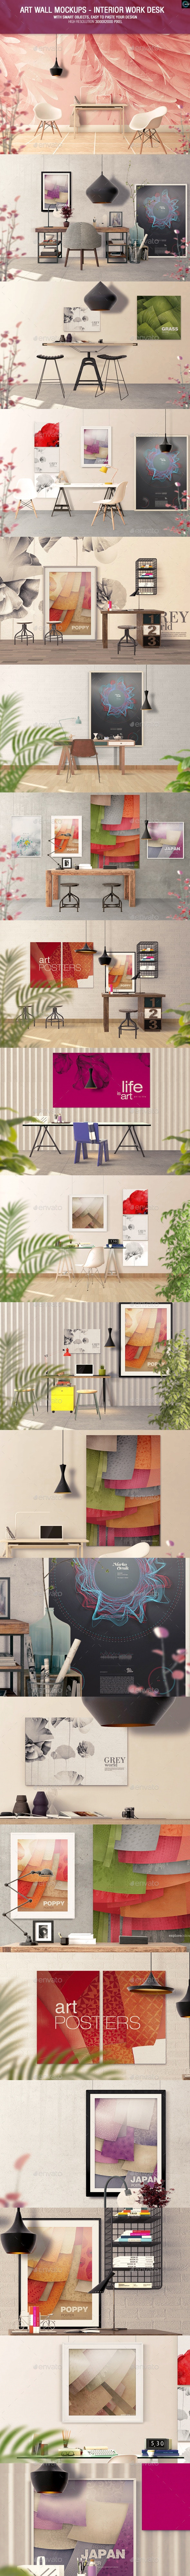 Art Wall Mockups - Interior Work Desk - Hero Images Graphics